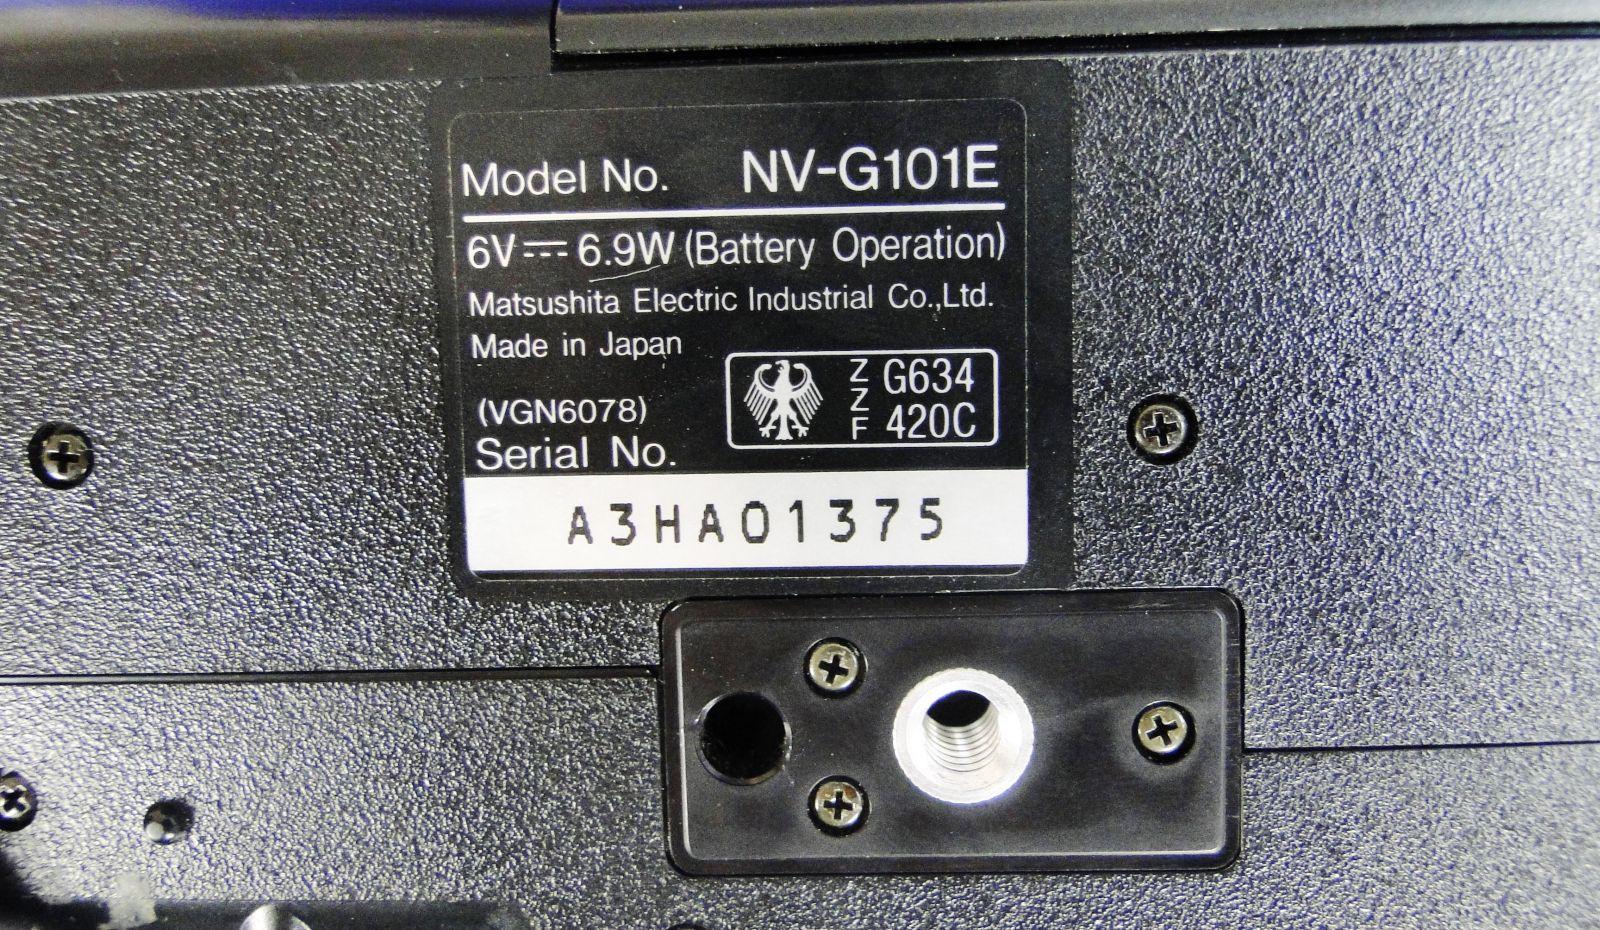 DSC08080.JPG (1600�930)